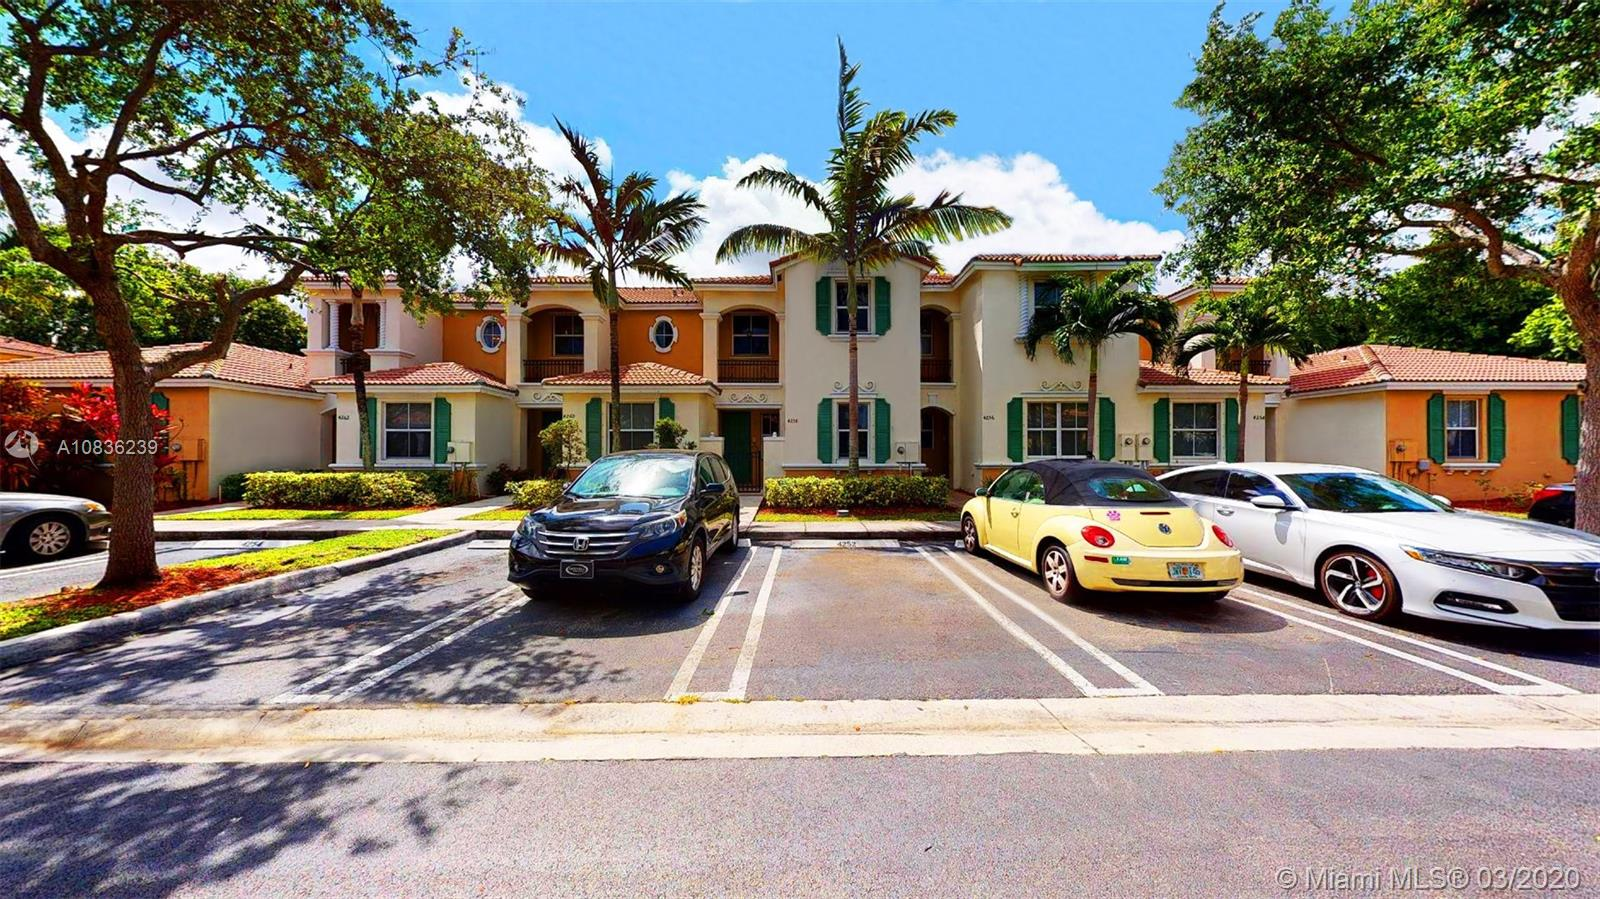 4258 NE 9th St, Homestead, FL 33033 - Homestead, FL real estate listing